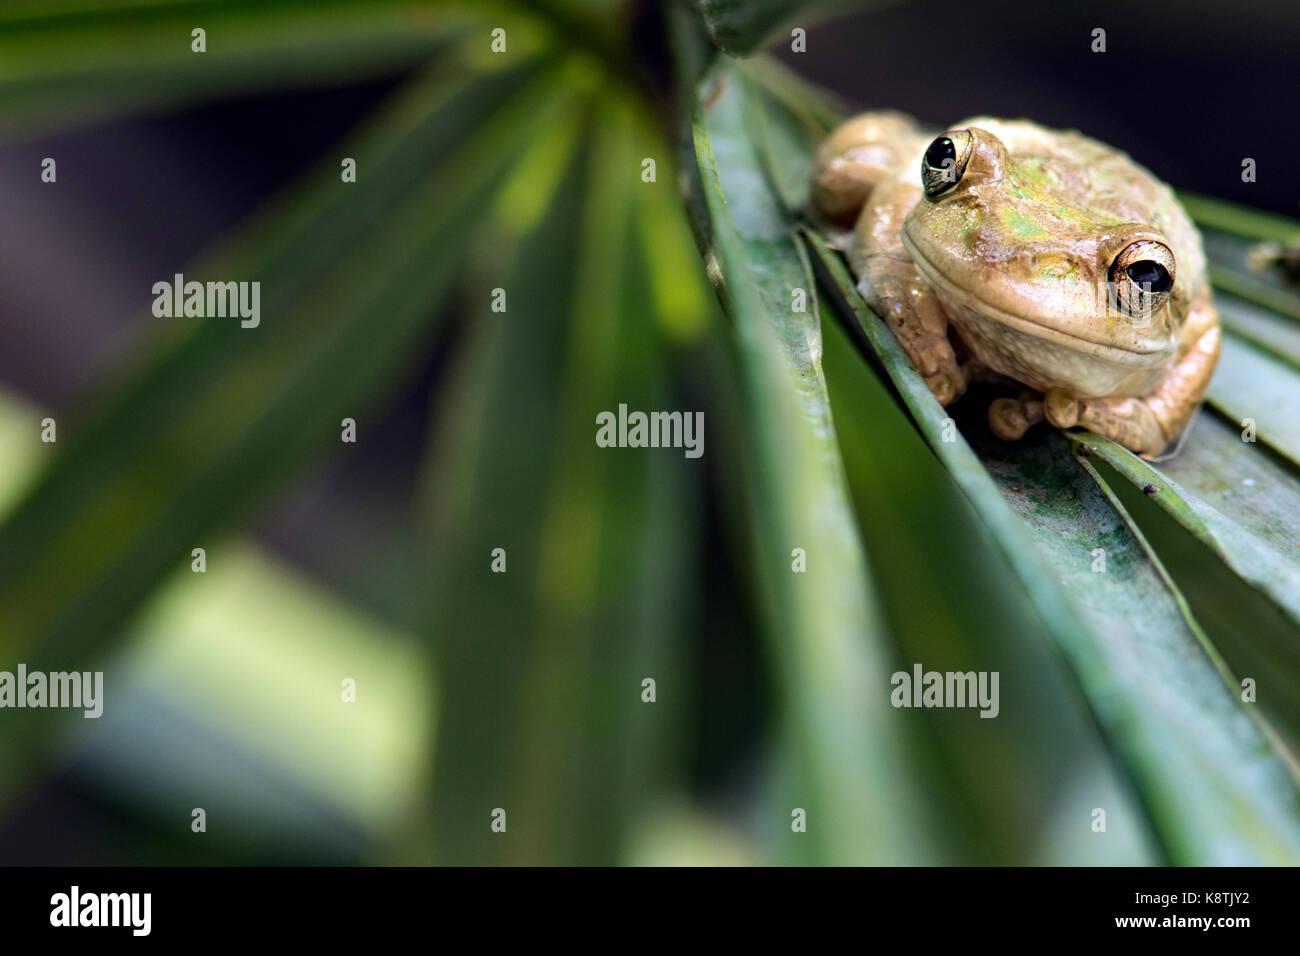 Kubanische Treefrog - Green Cay Feuchtgebiete, Boynton Beach, Florida, USA Stockfoto